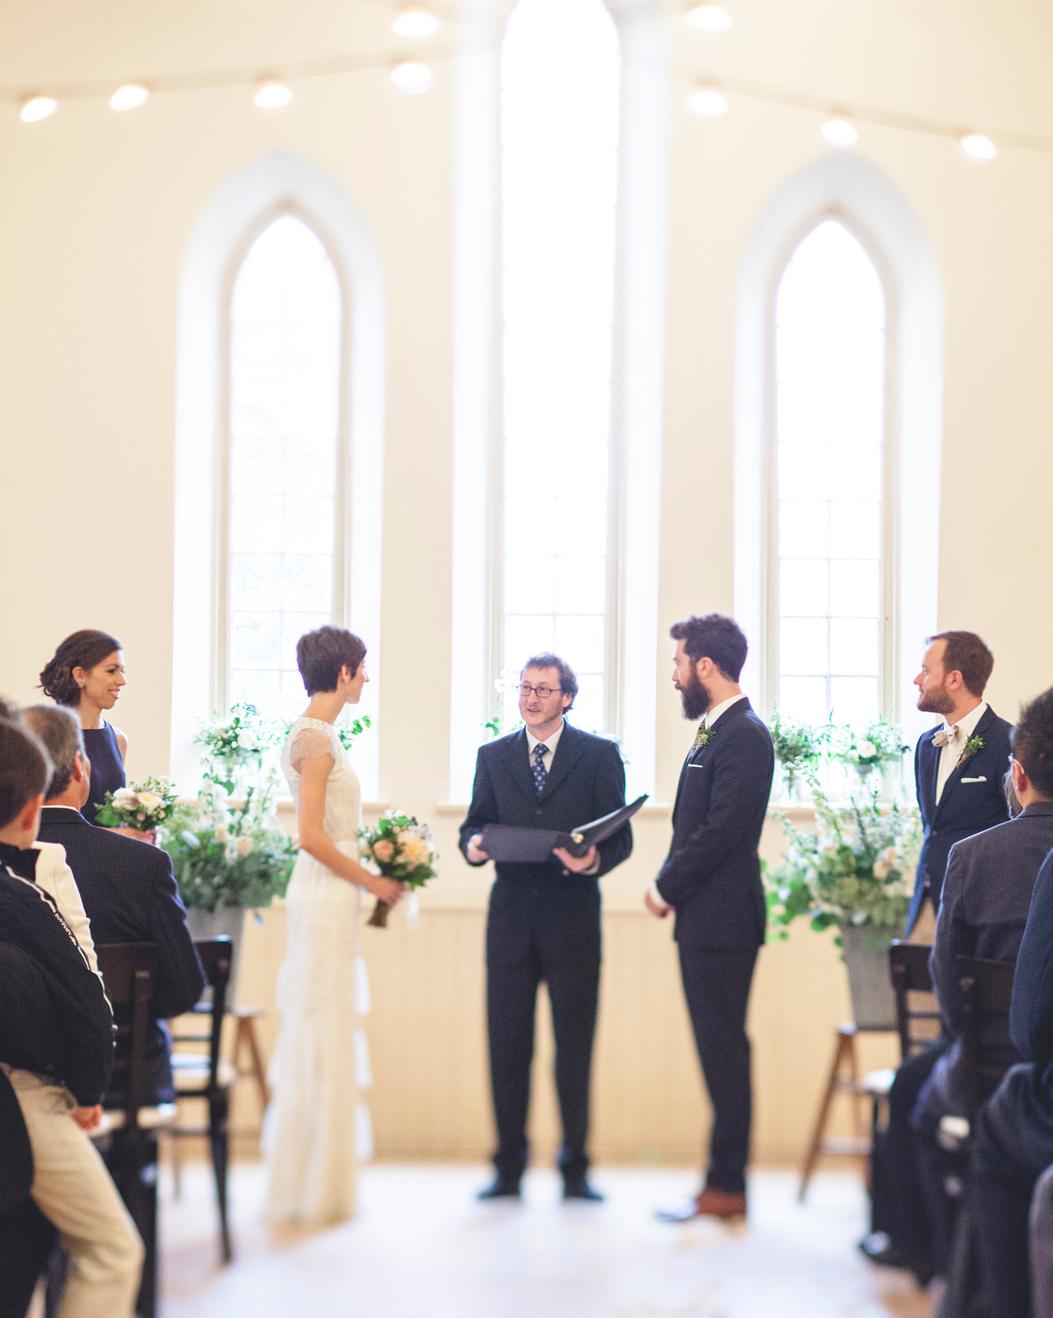 trish-alan-wedding-ceremony-049-s111348-0714.jpg